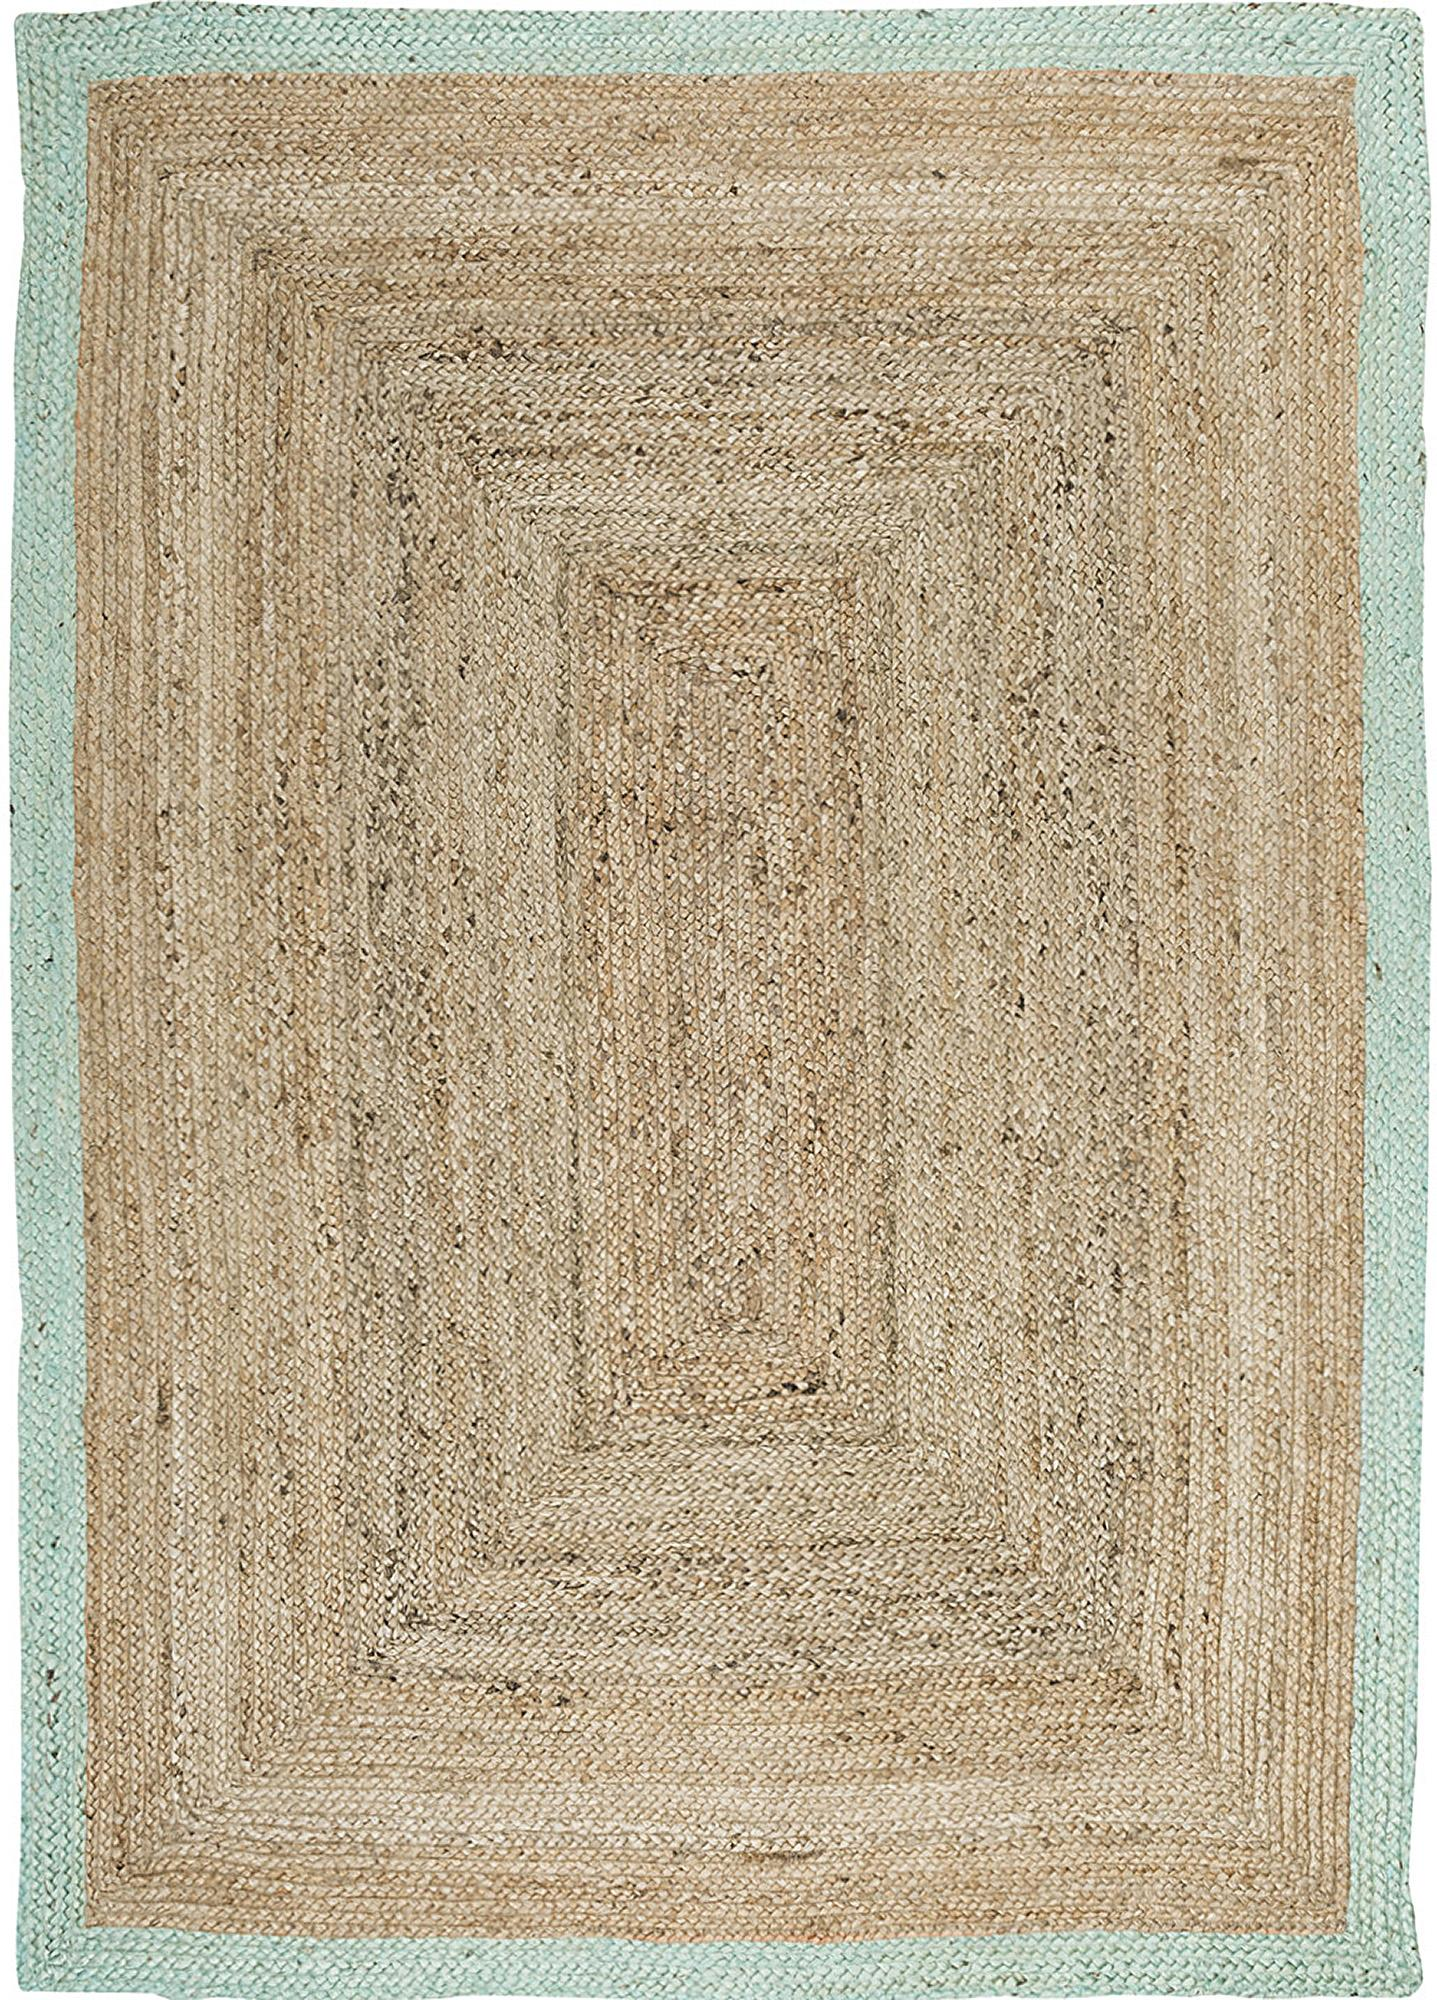 Tappeto in juta tessuto a mano Shanta, Retro: iuta, Juta, verde menta, P 120 x L 180 cm